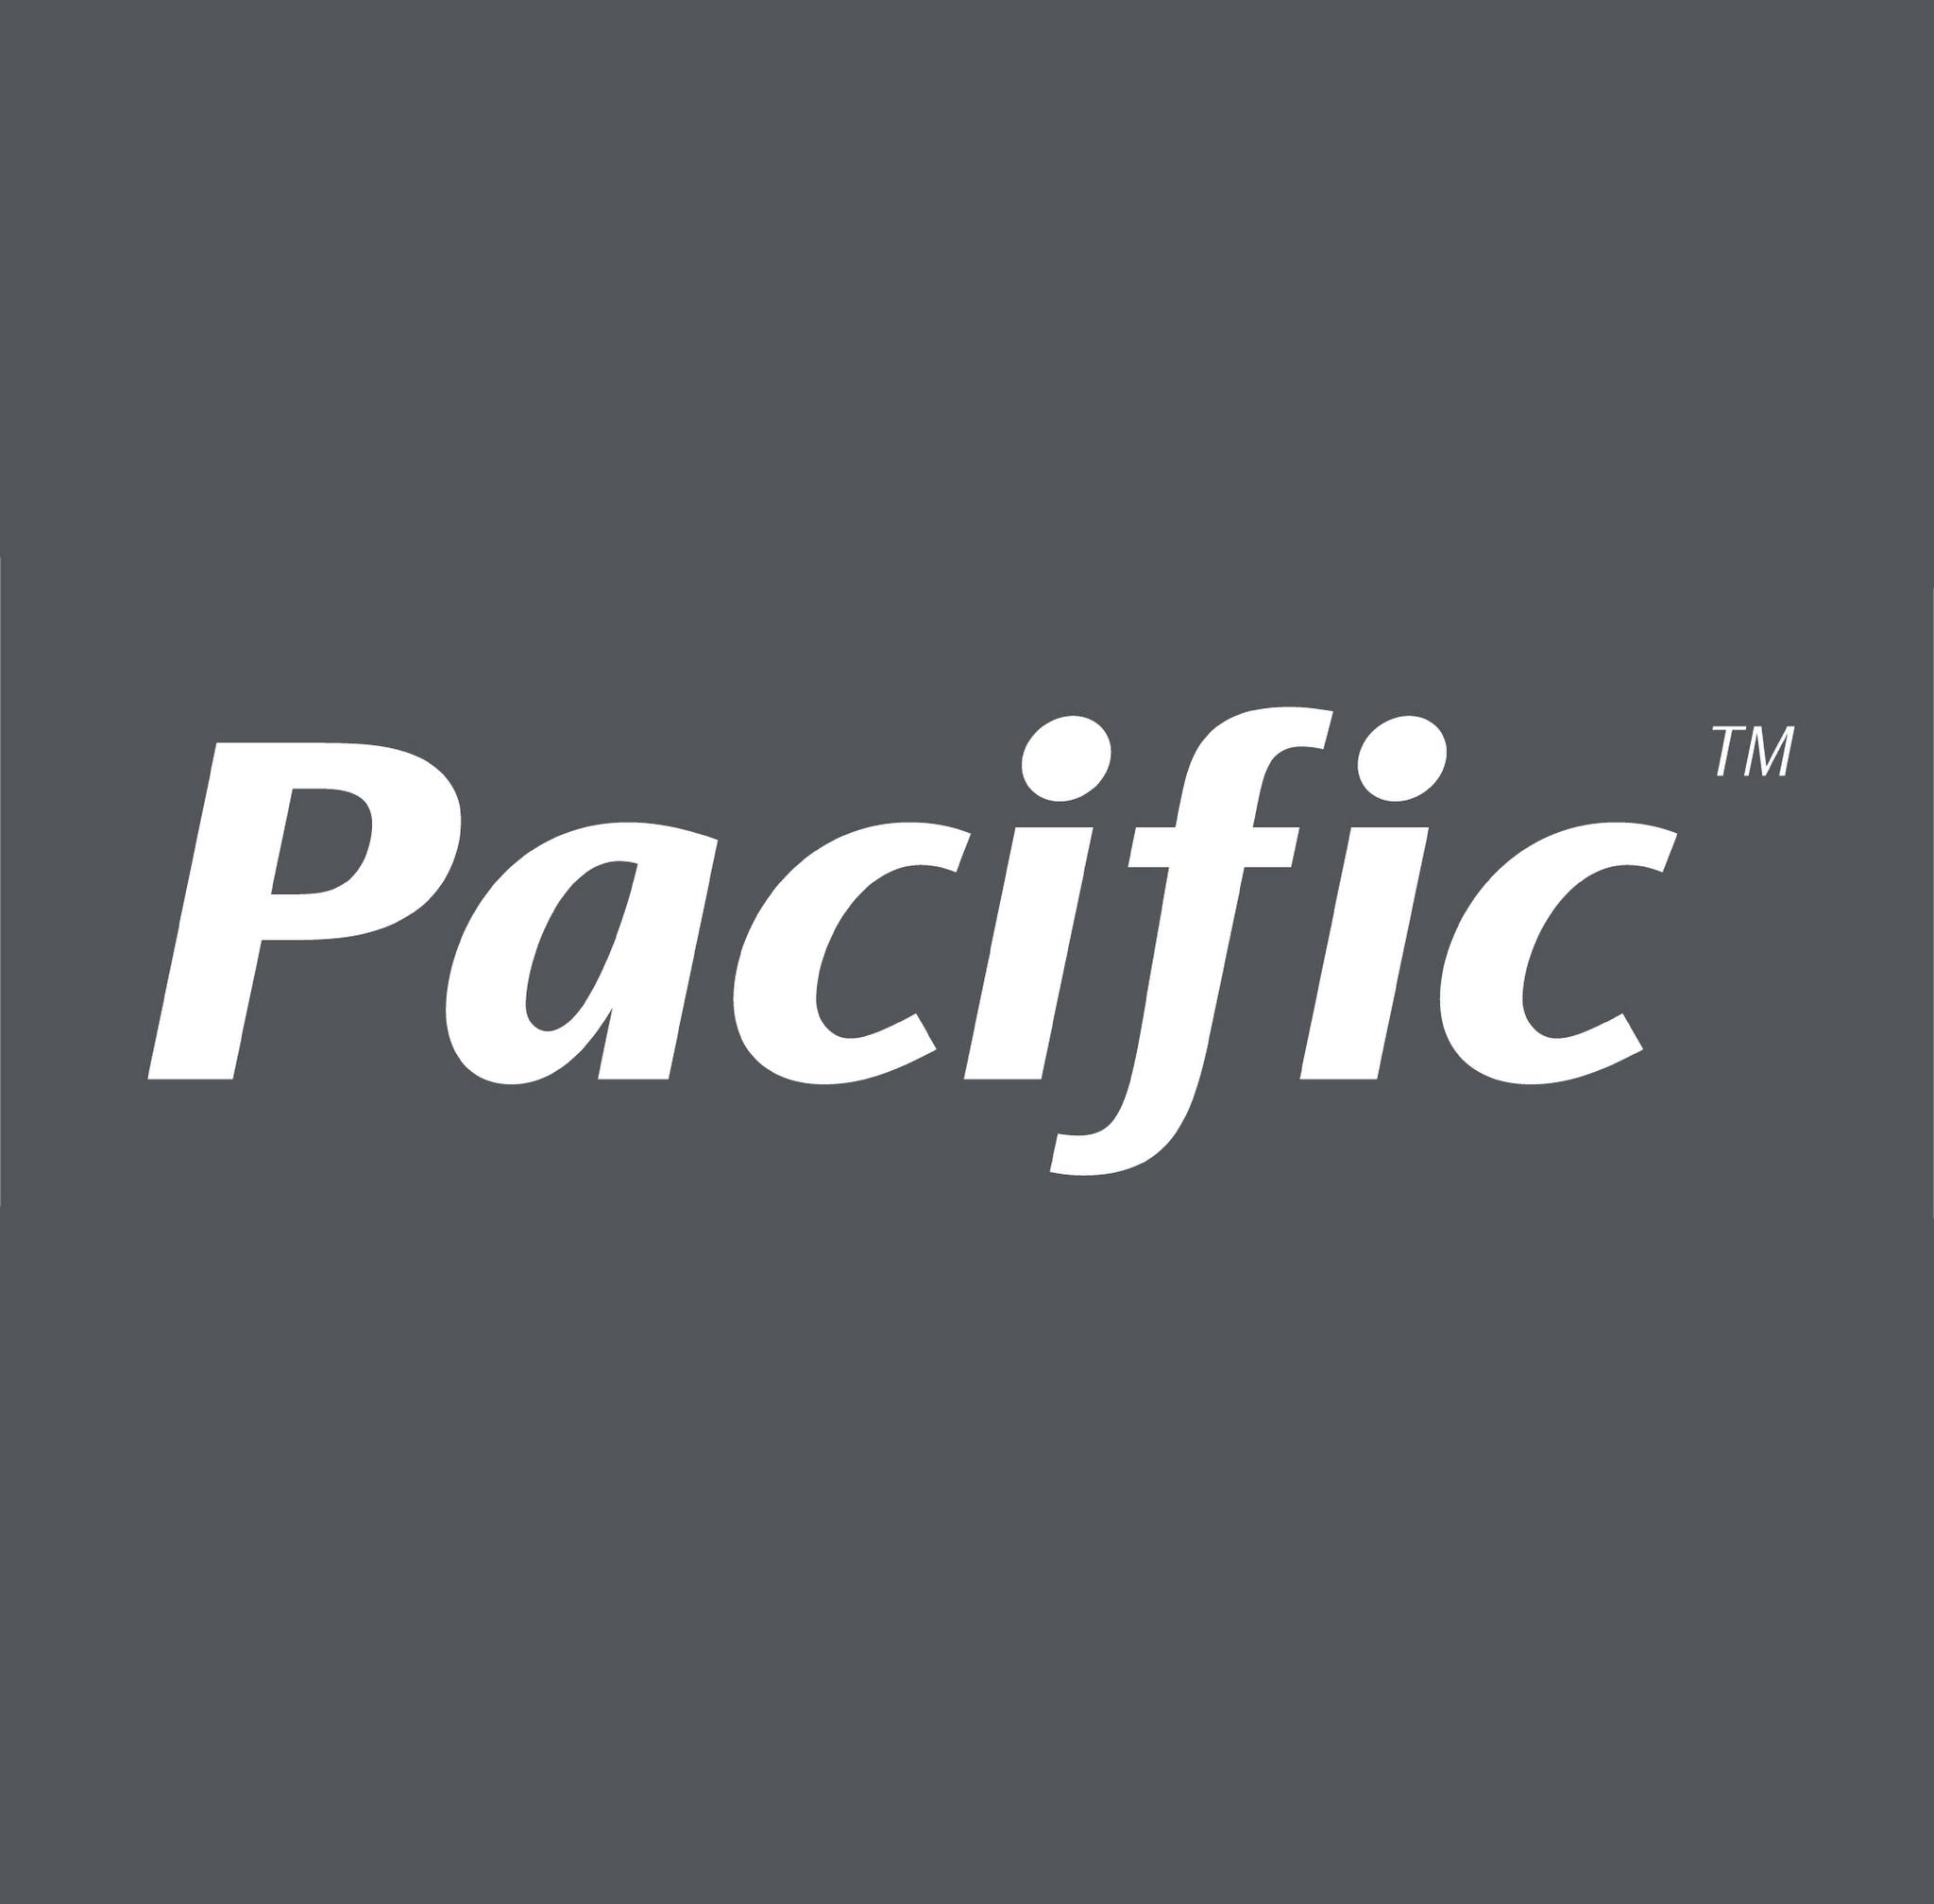 Pacific Lifestyle Ltd